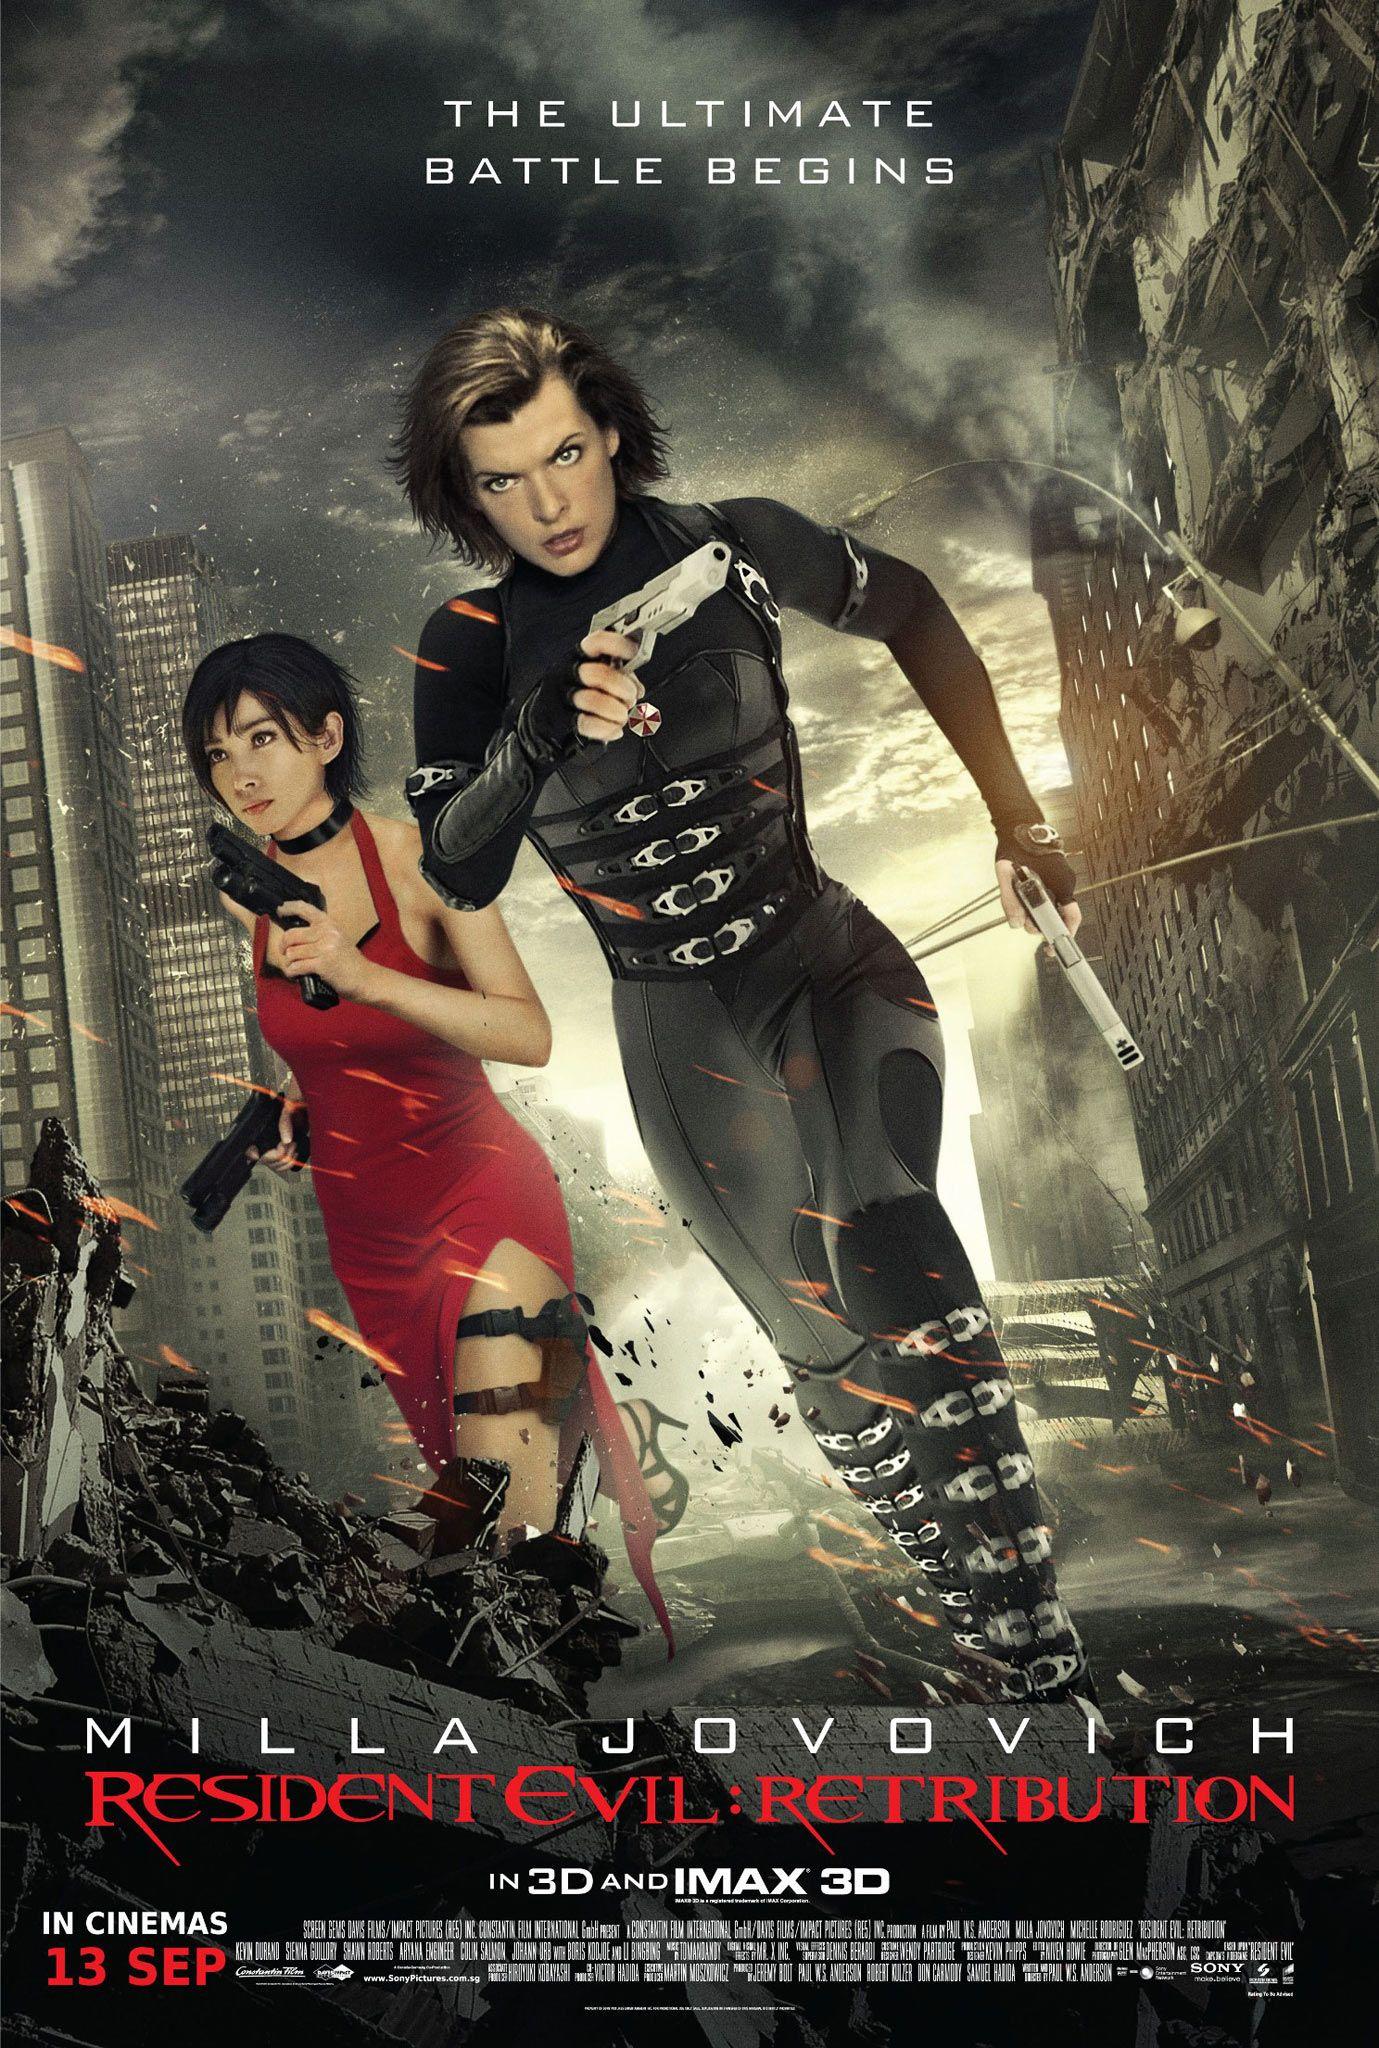 Resident Evil Movie Poster Resident Evil Retribution Poster Free Download X